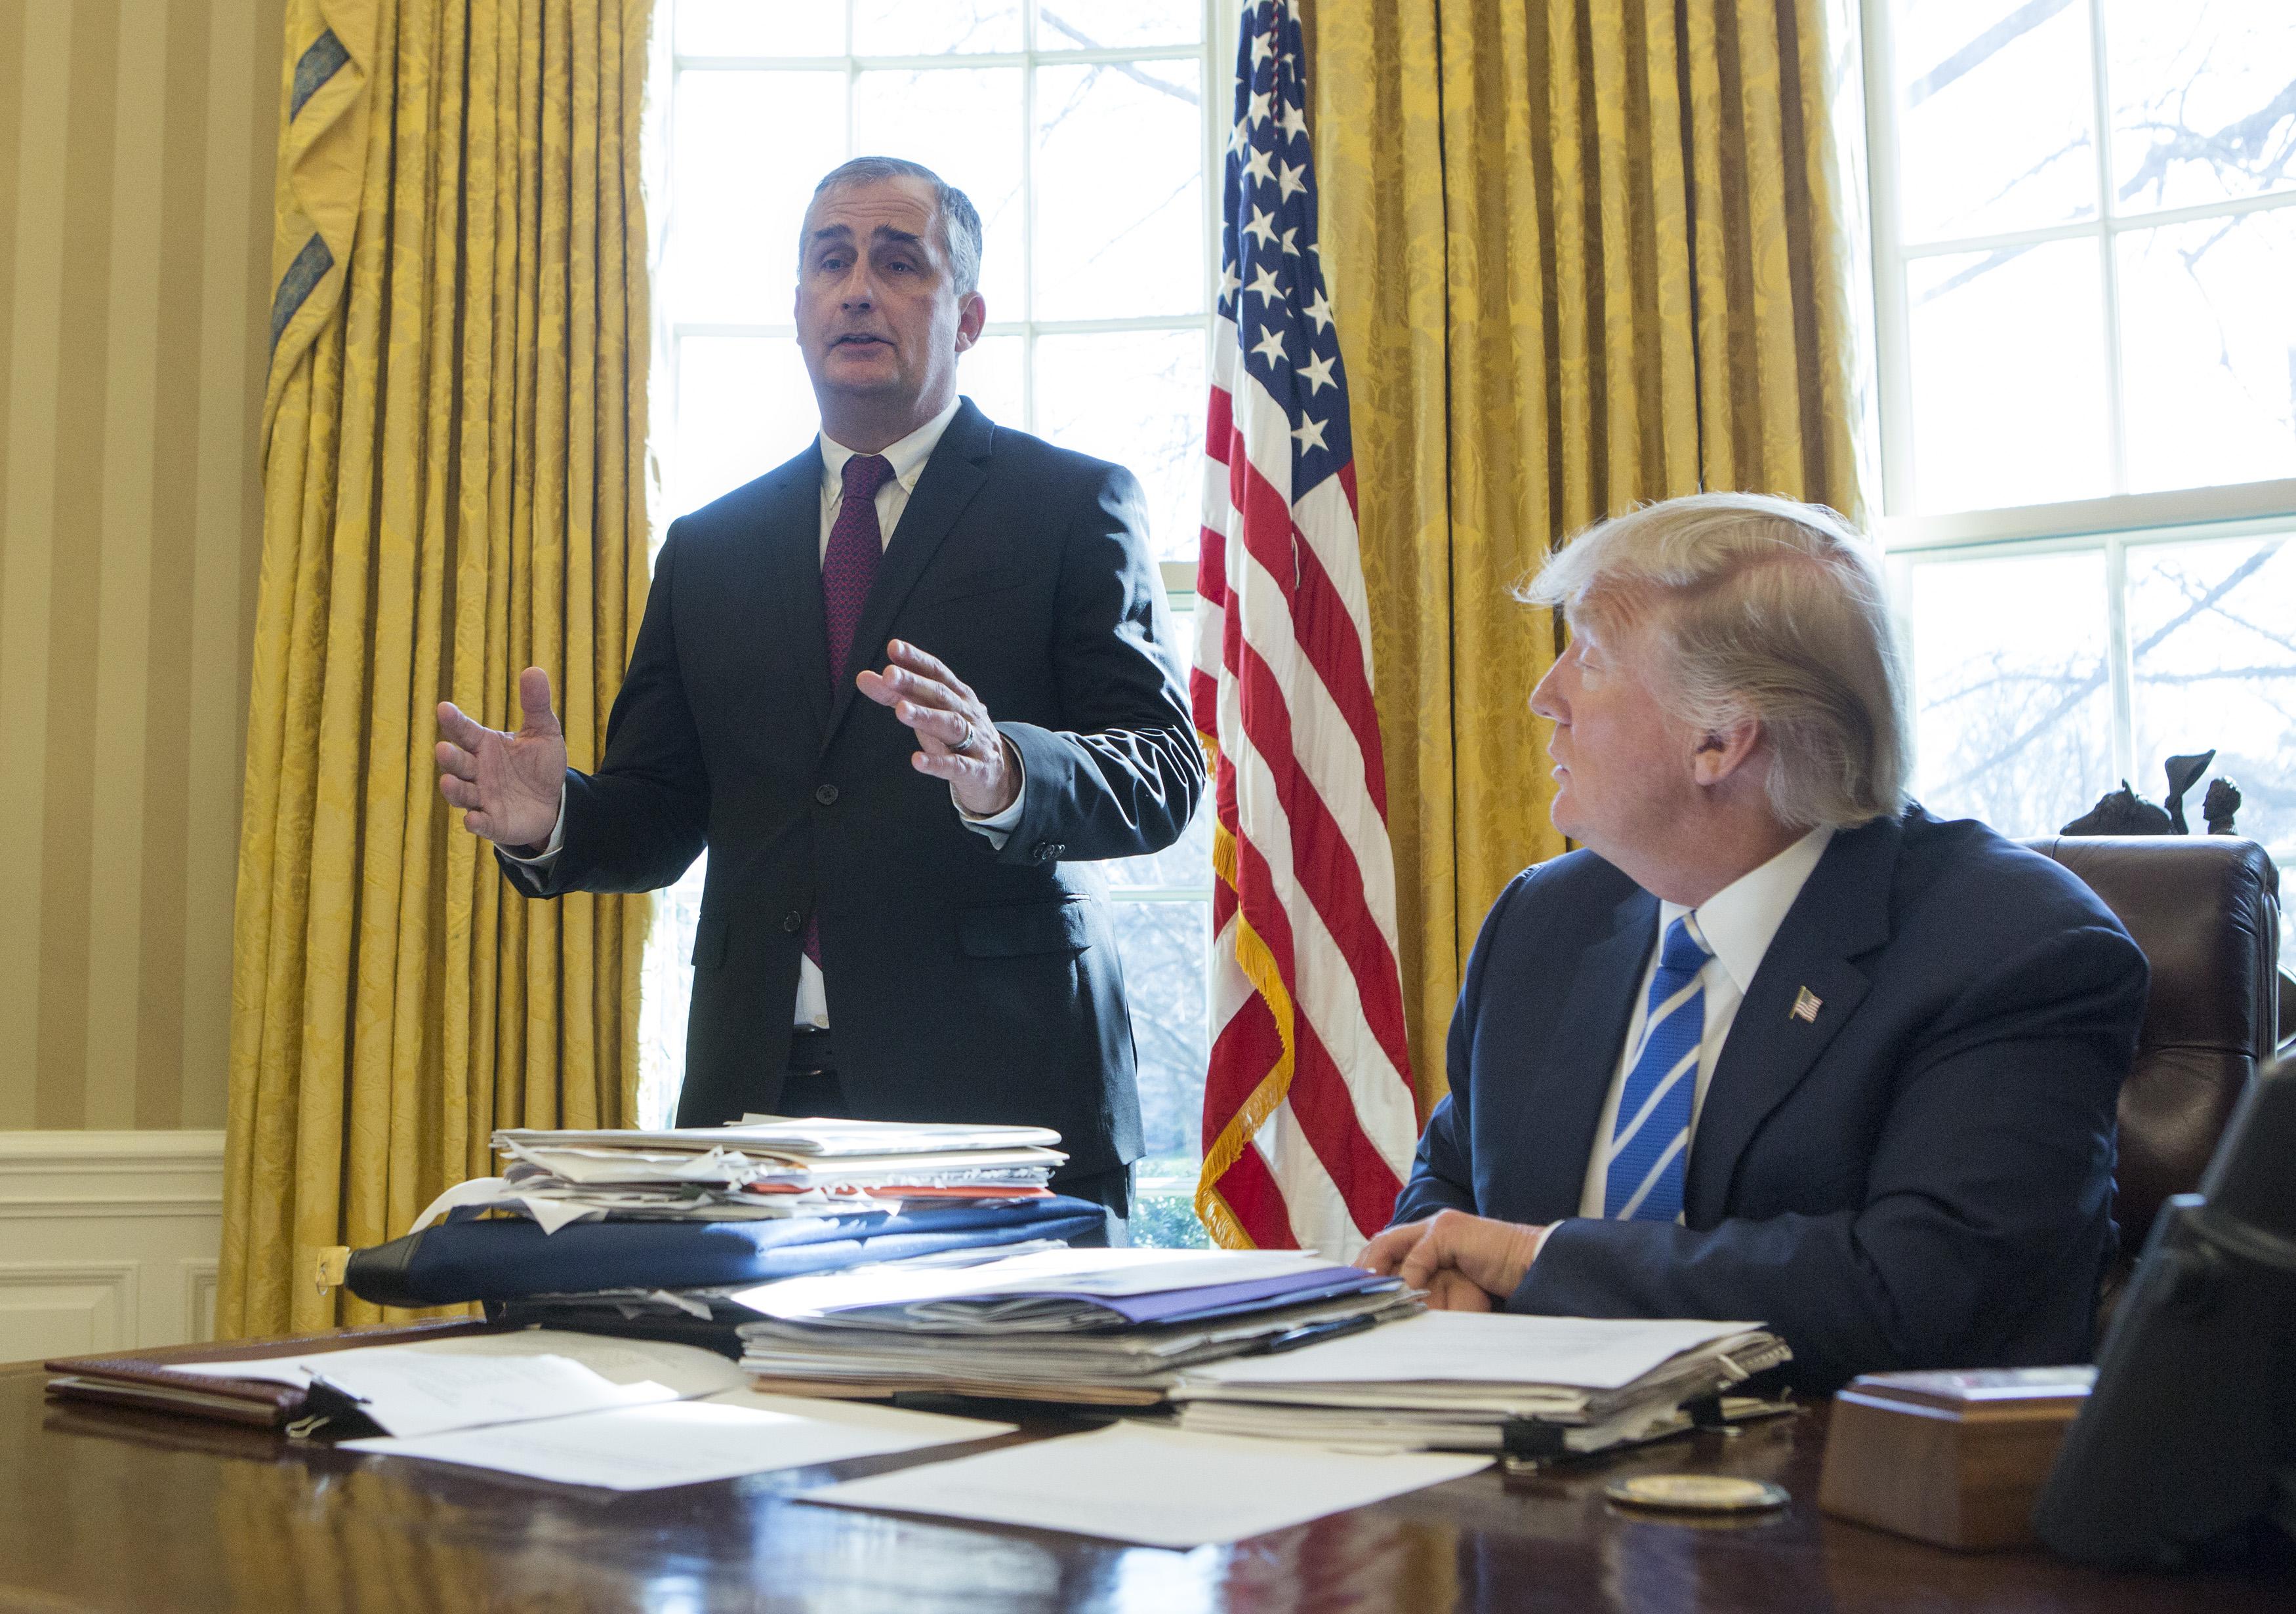 Президент США Дональд Трамп. Фото: EPA